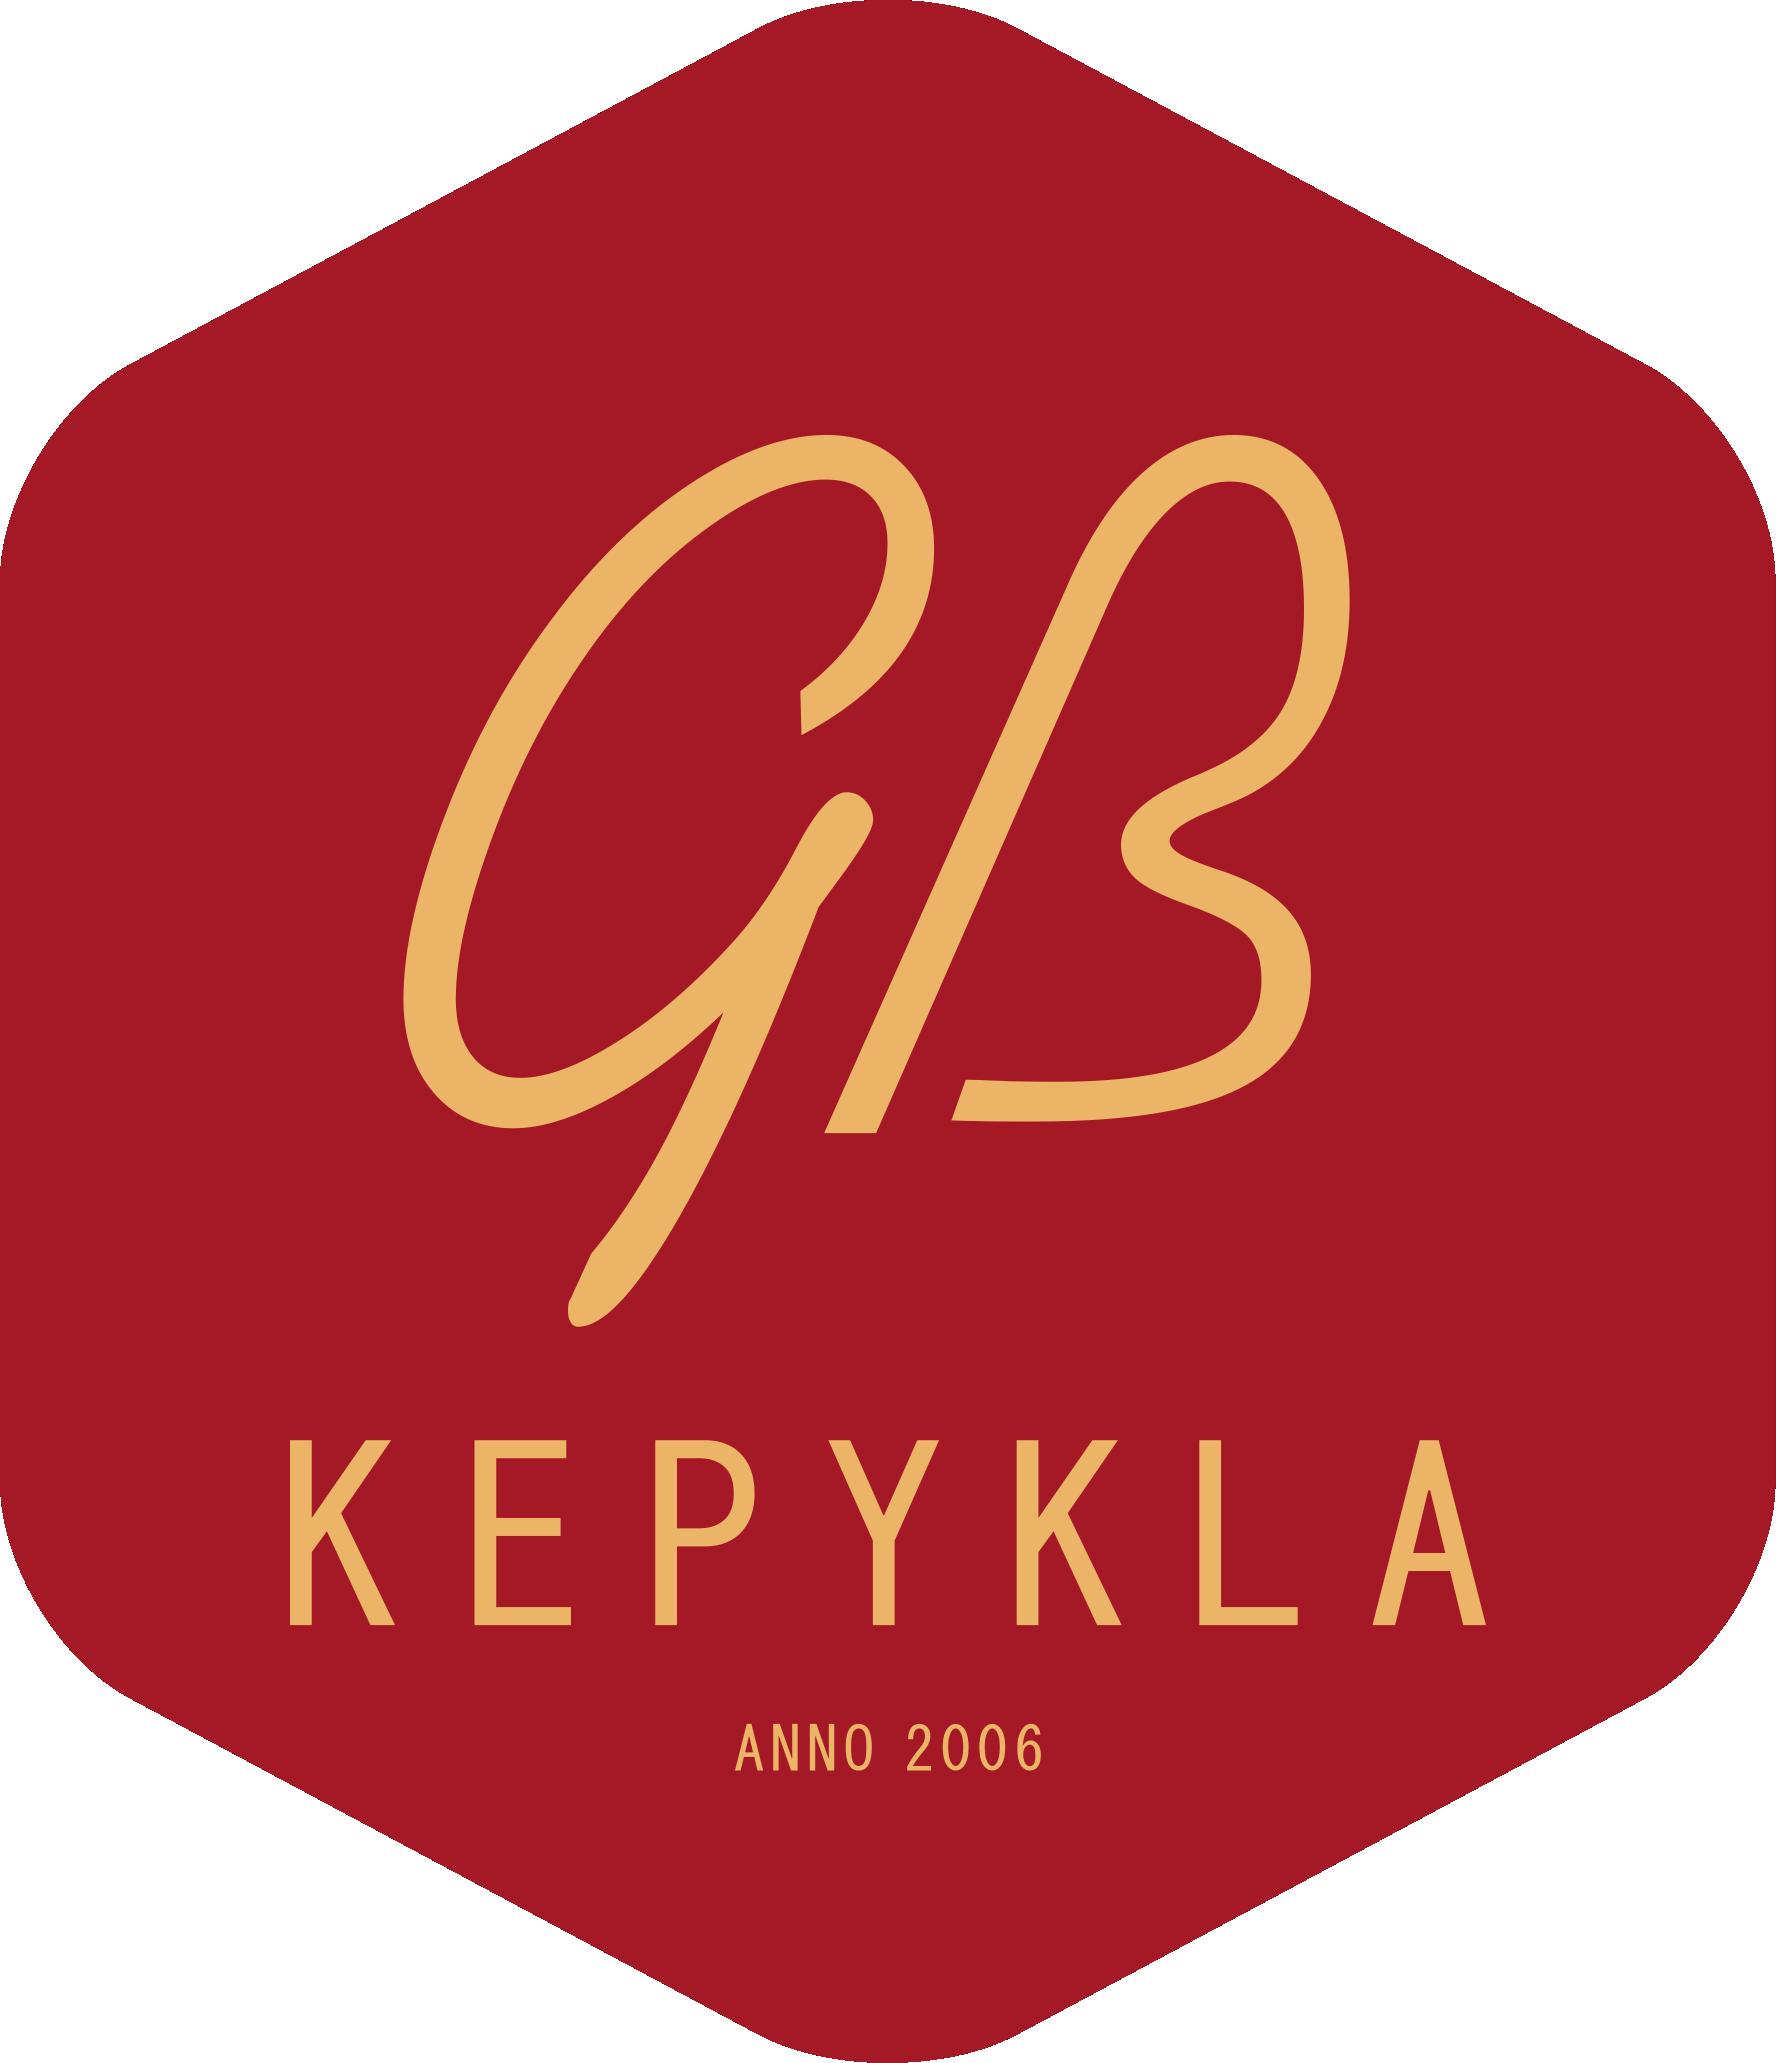 GB kepykla